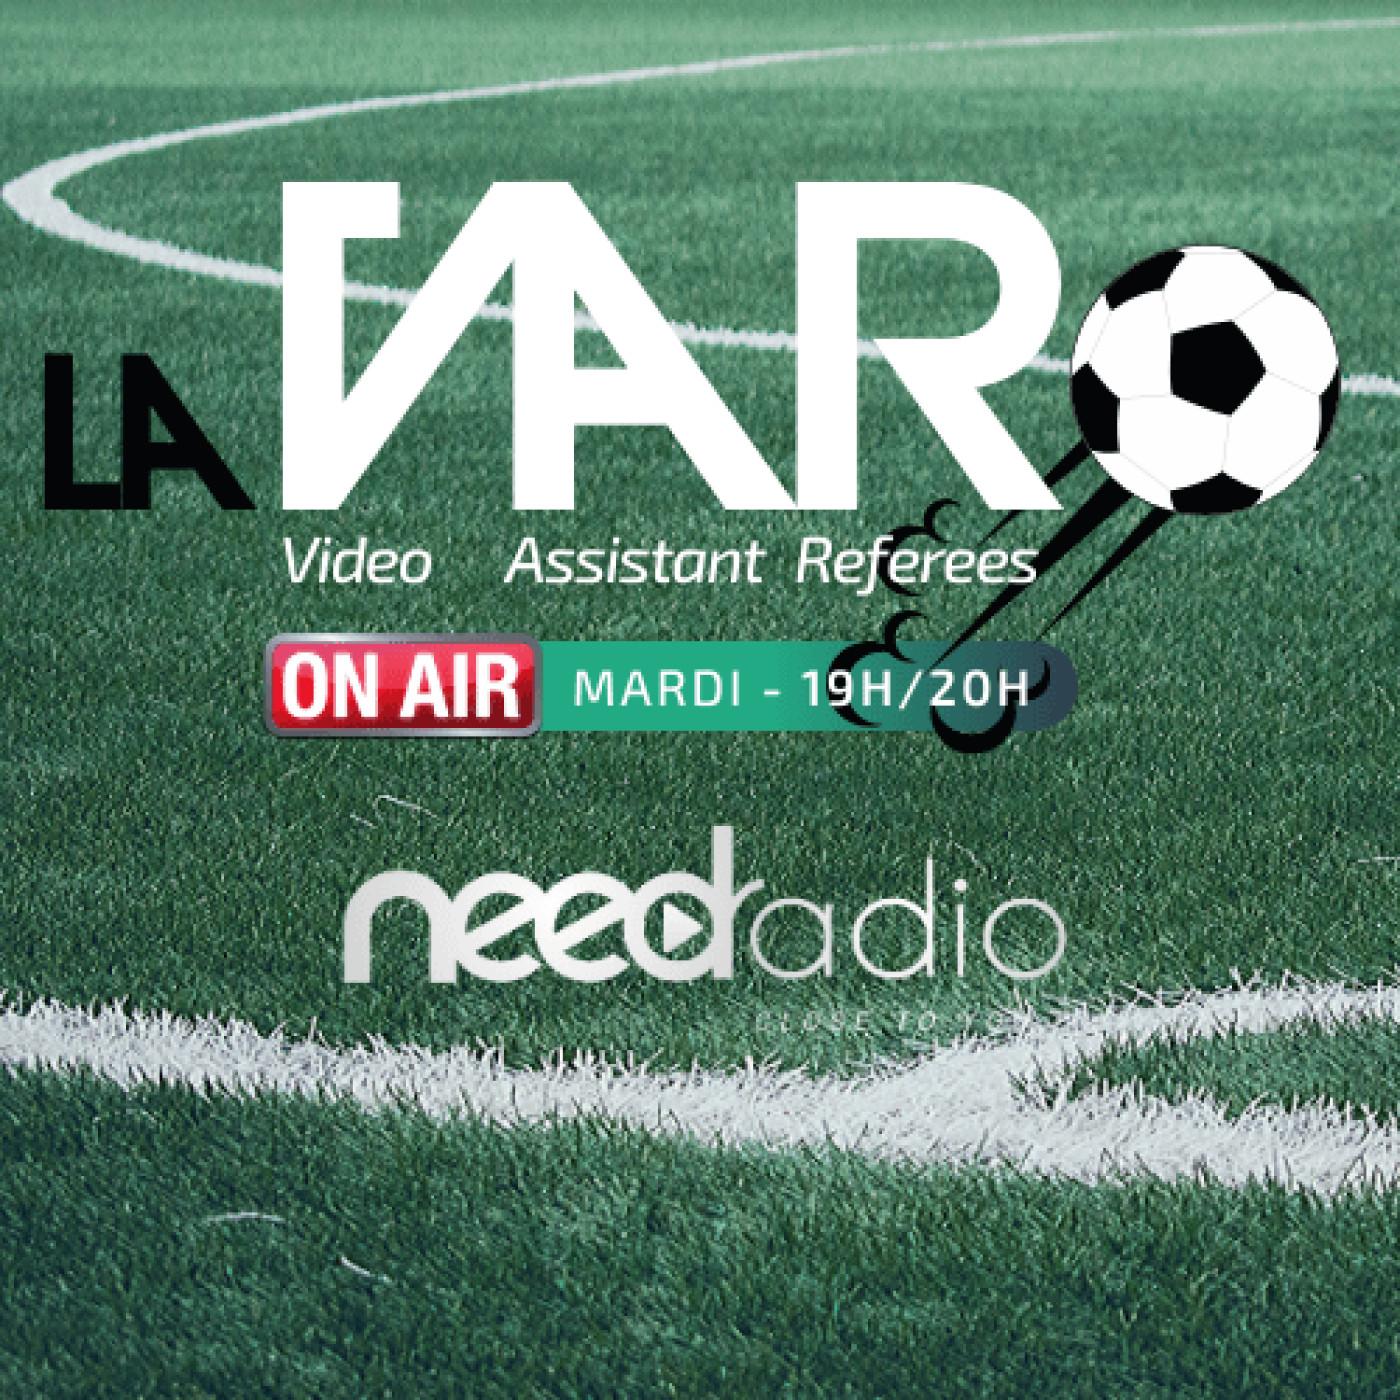 La VAR n°2 : Ligue 1, Dortmund, mercato et Mediapro (28/01/20)